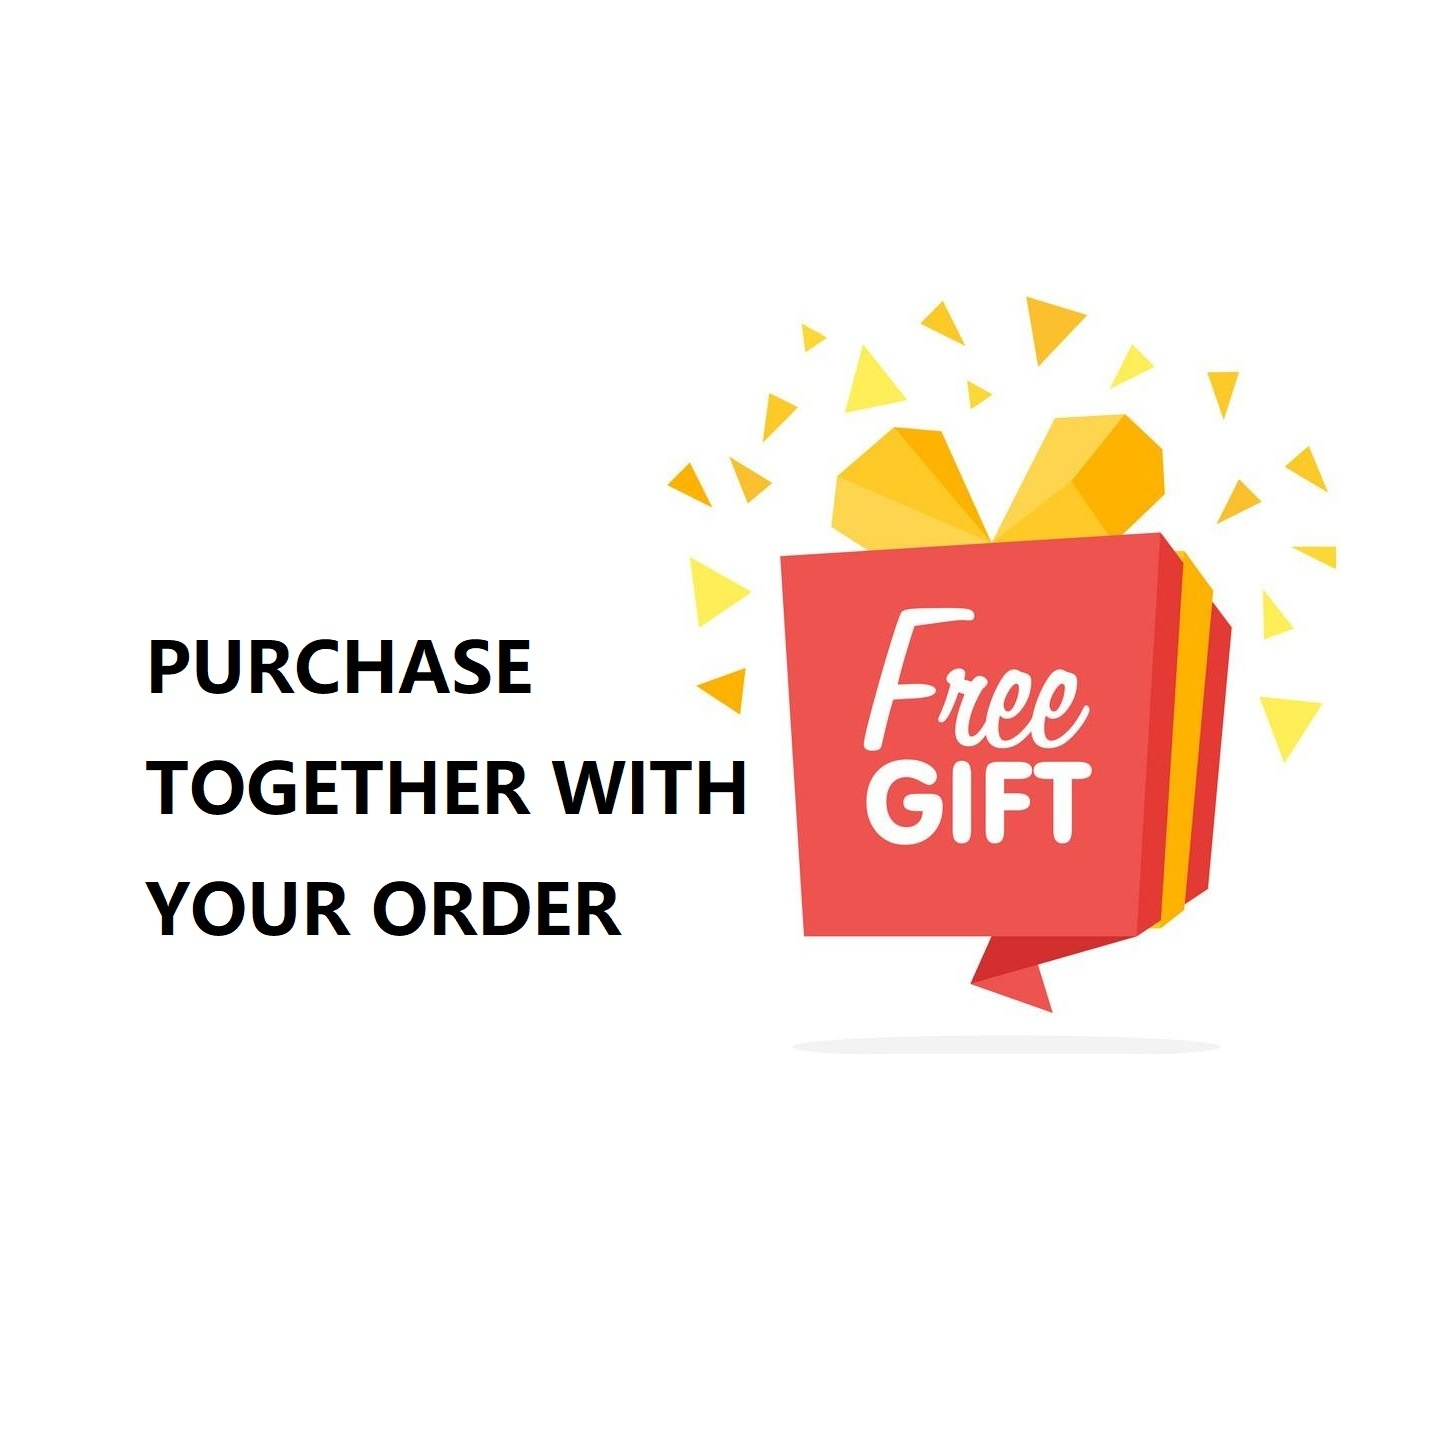 FREE GIFT Max 1 per order / GRATIS CADEAU Max 1 per bestelling